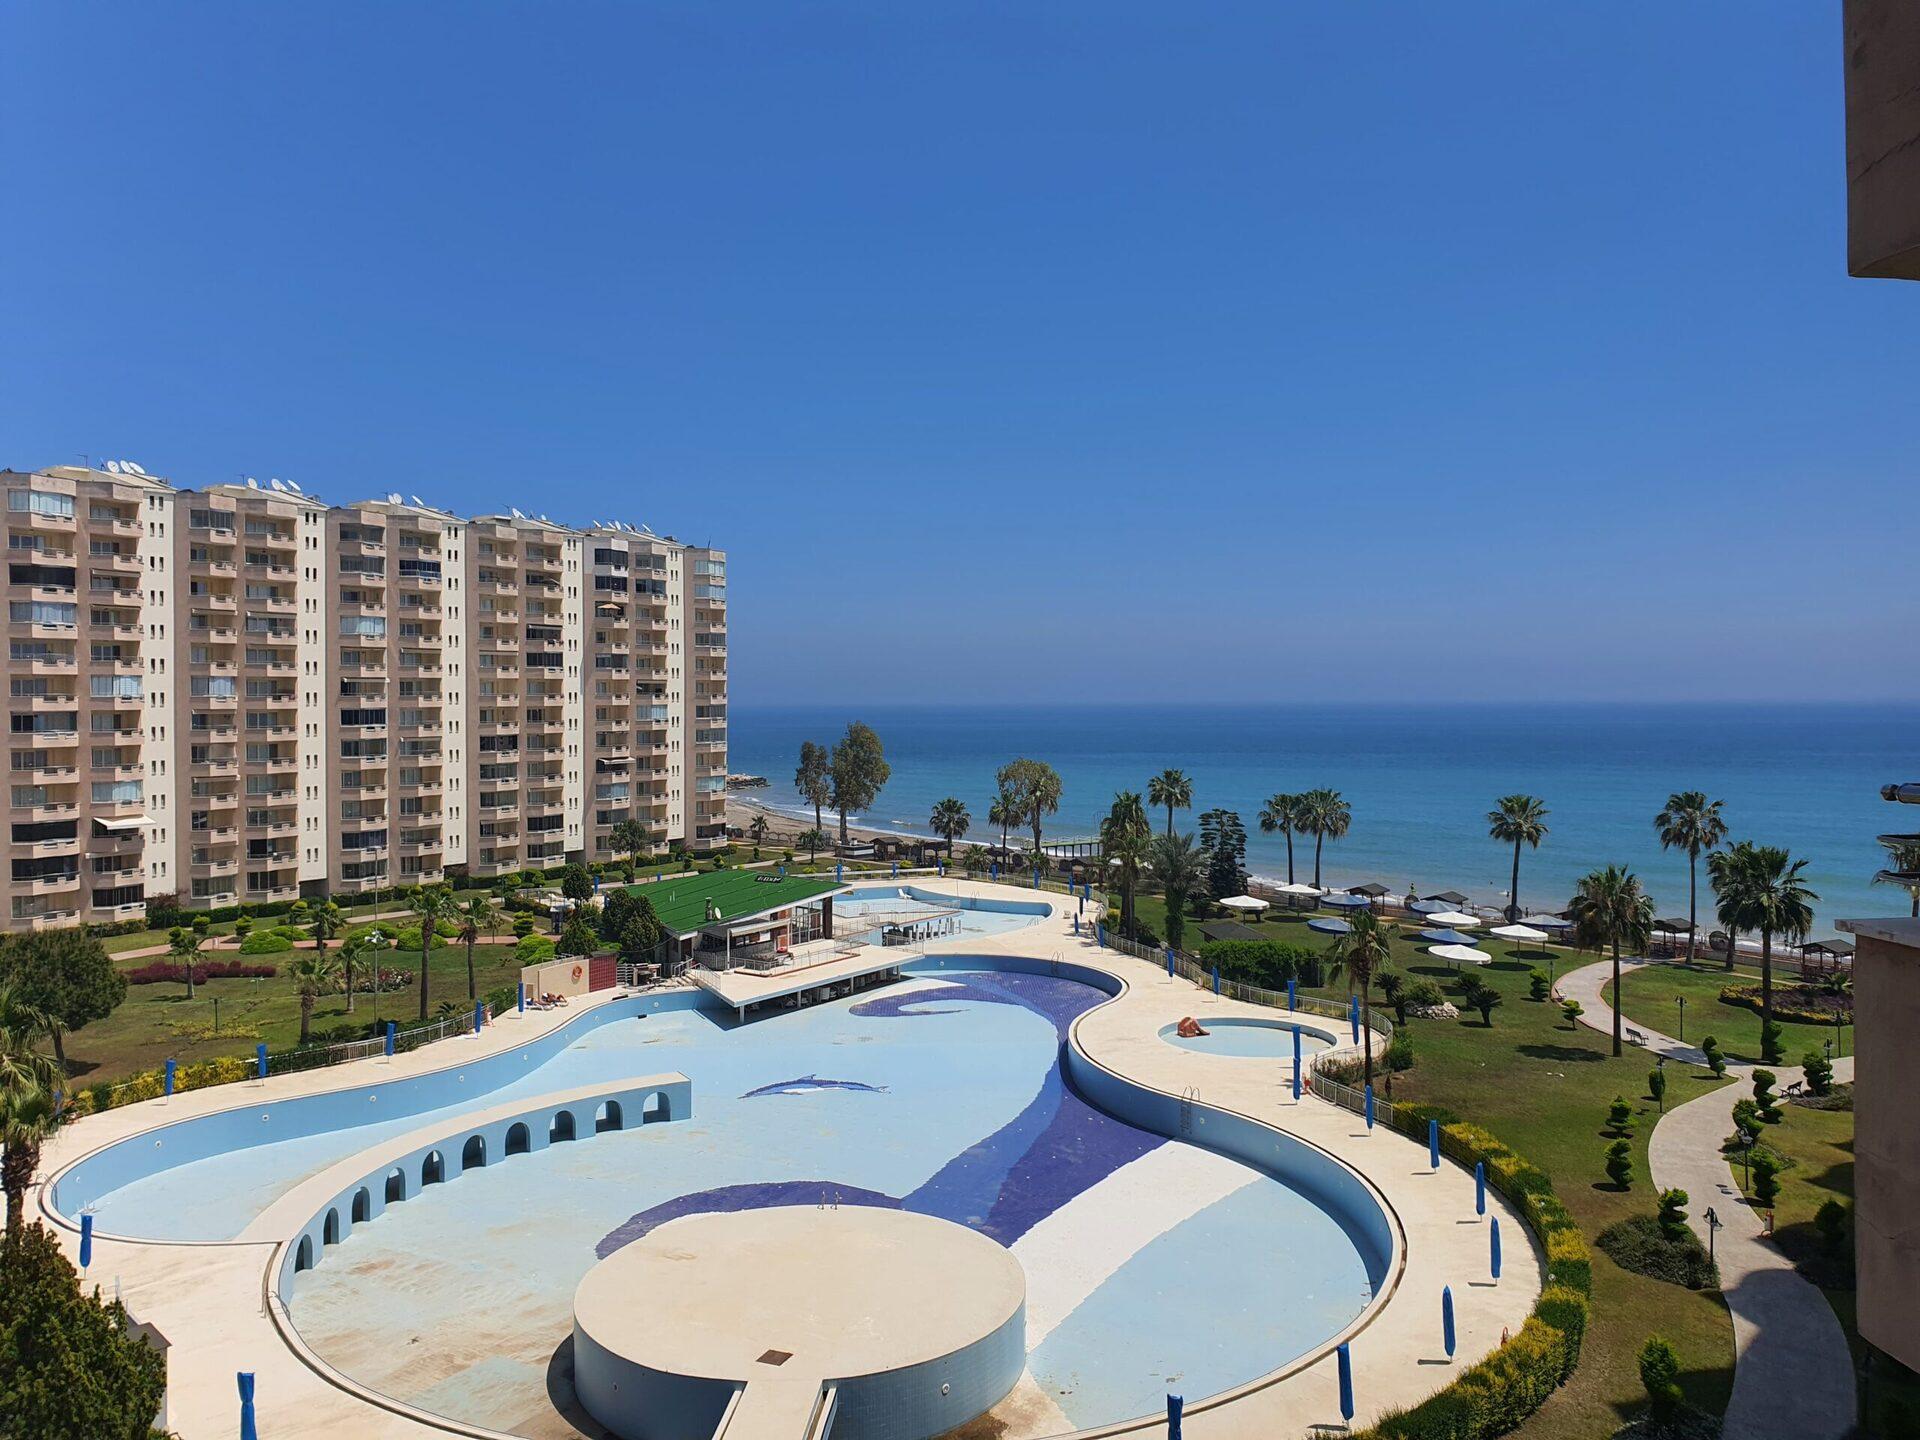 Mersin Erdemli Kargıpınarı Queenaba Site 3 + 1 Summer Apartment